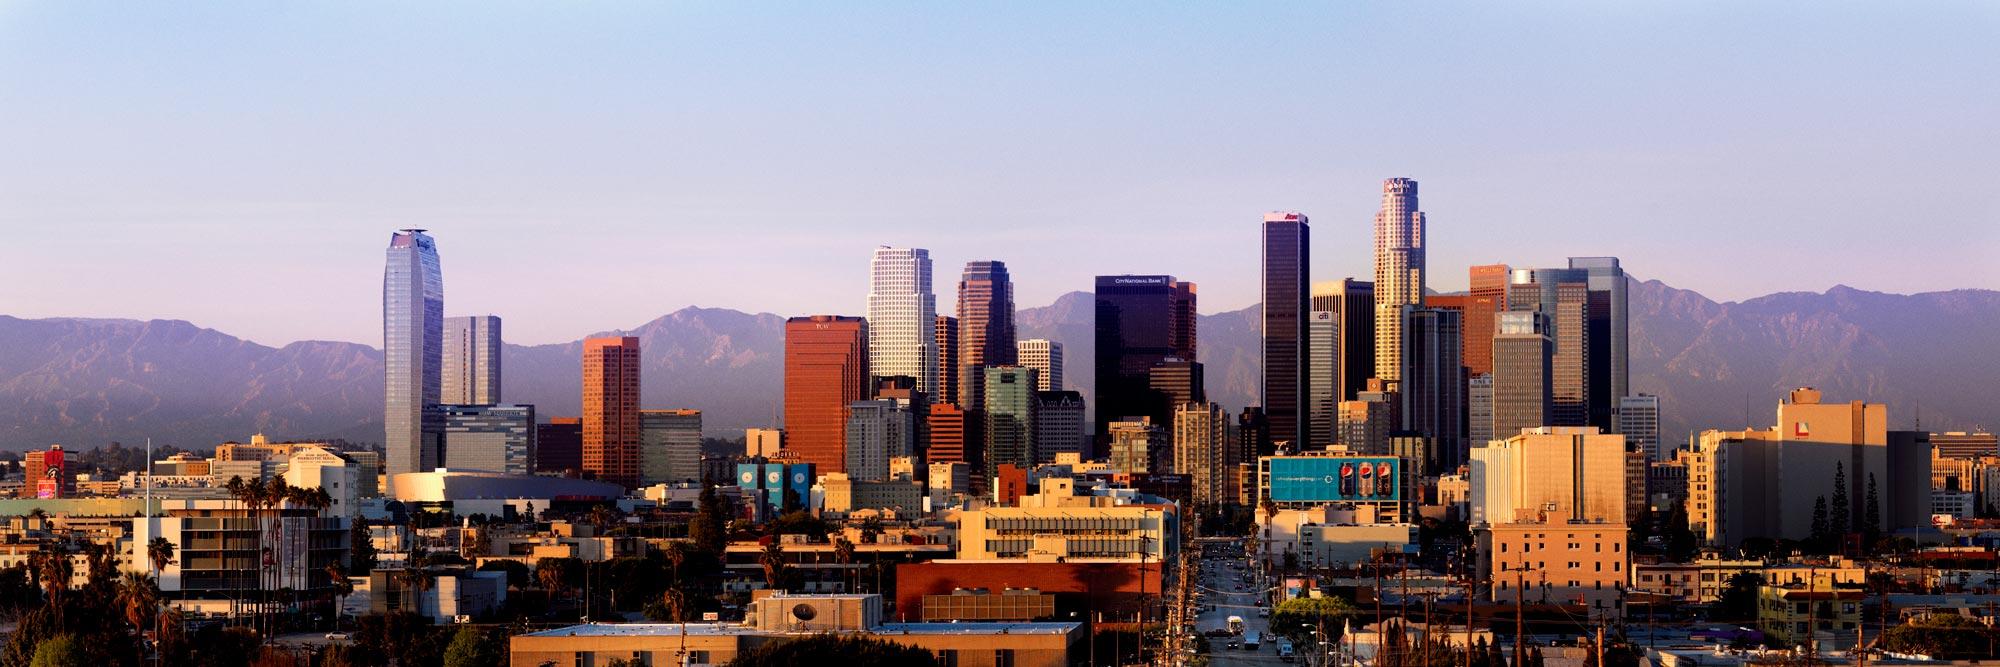 California panoramic